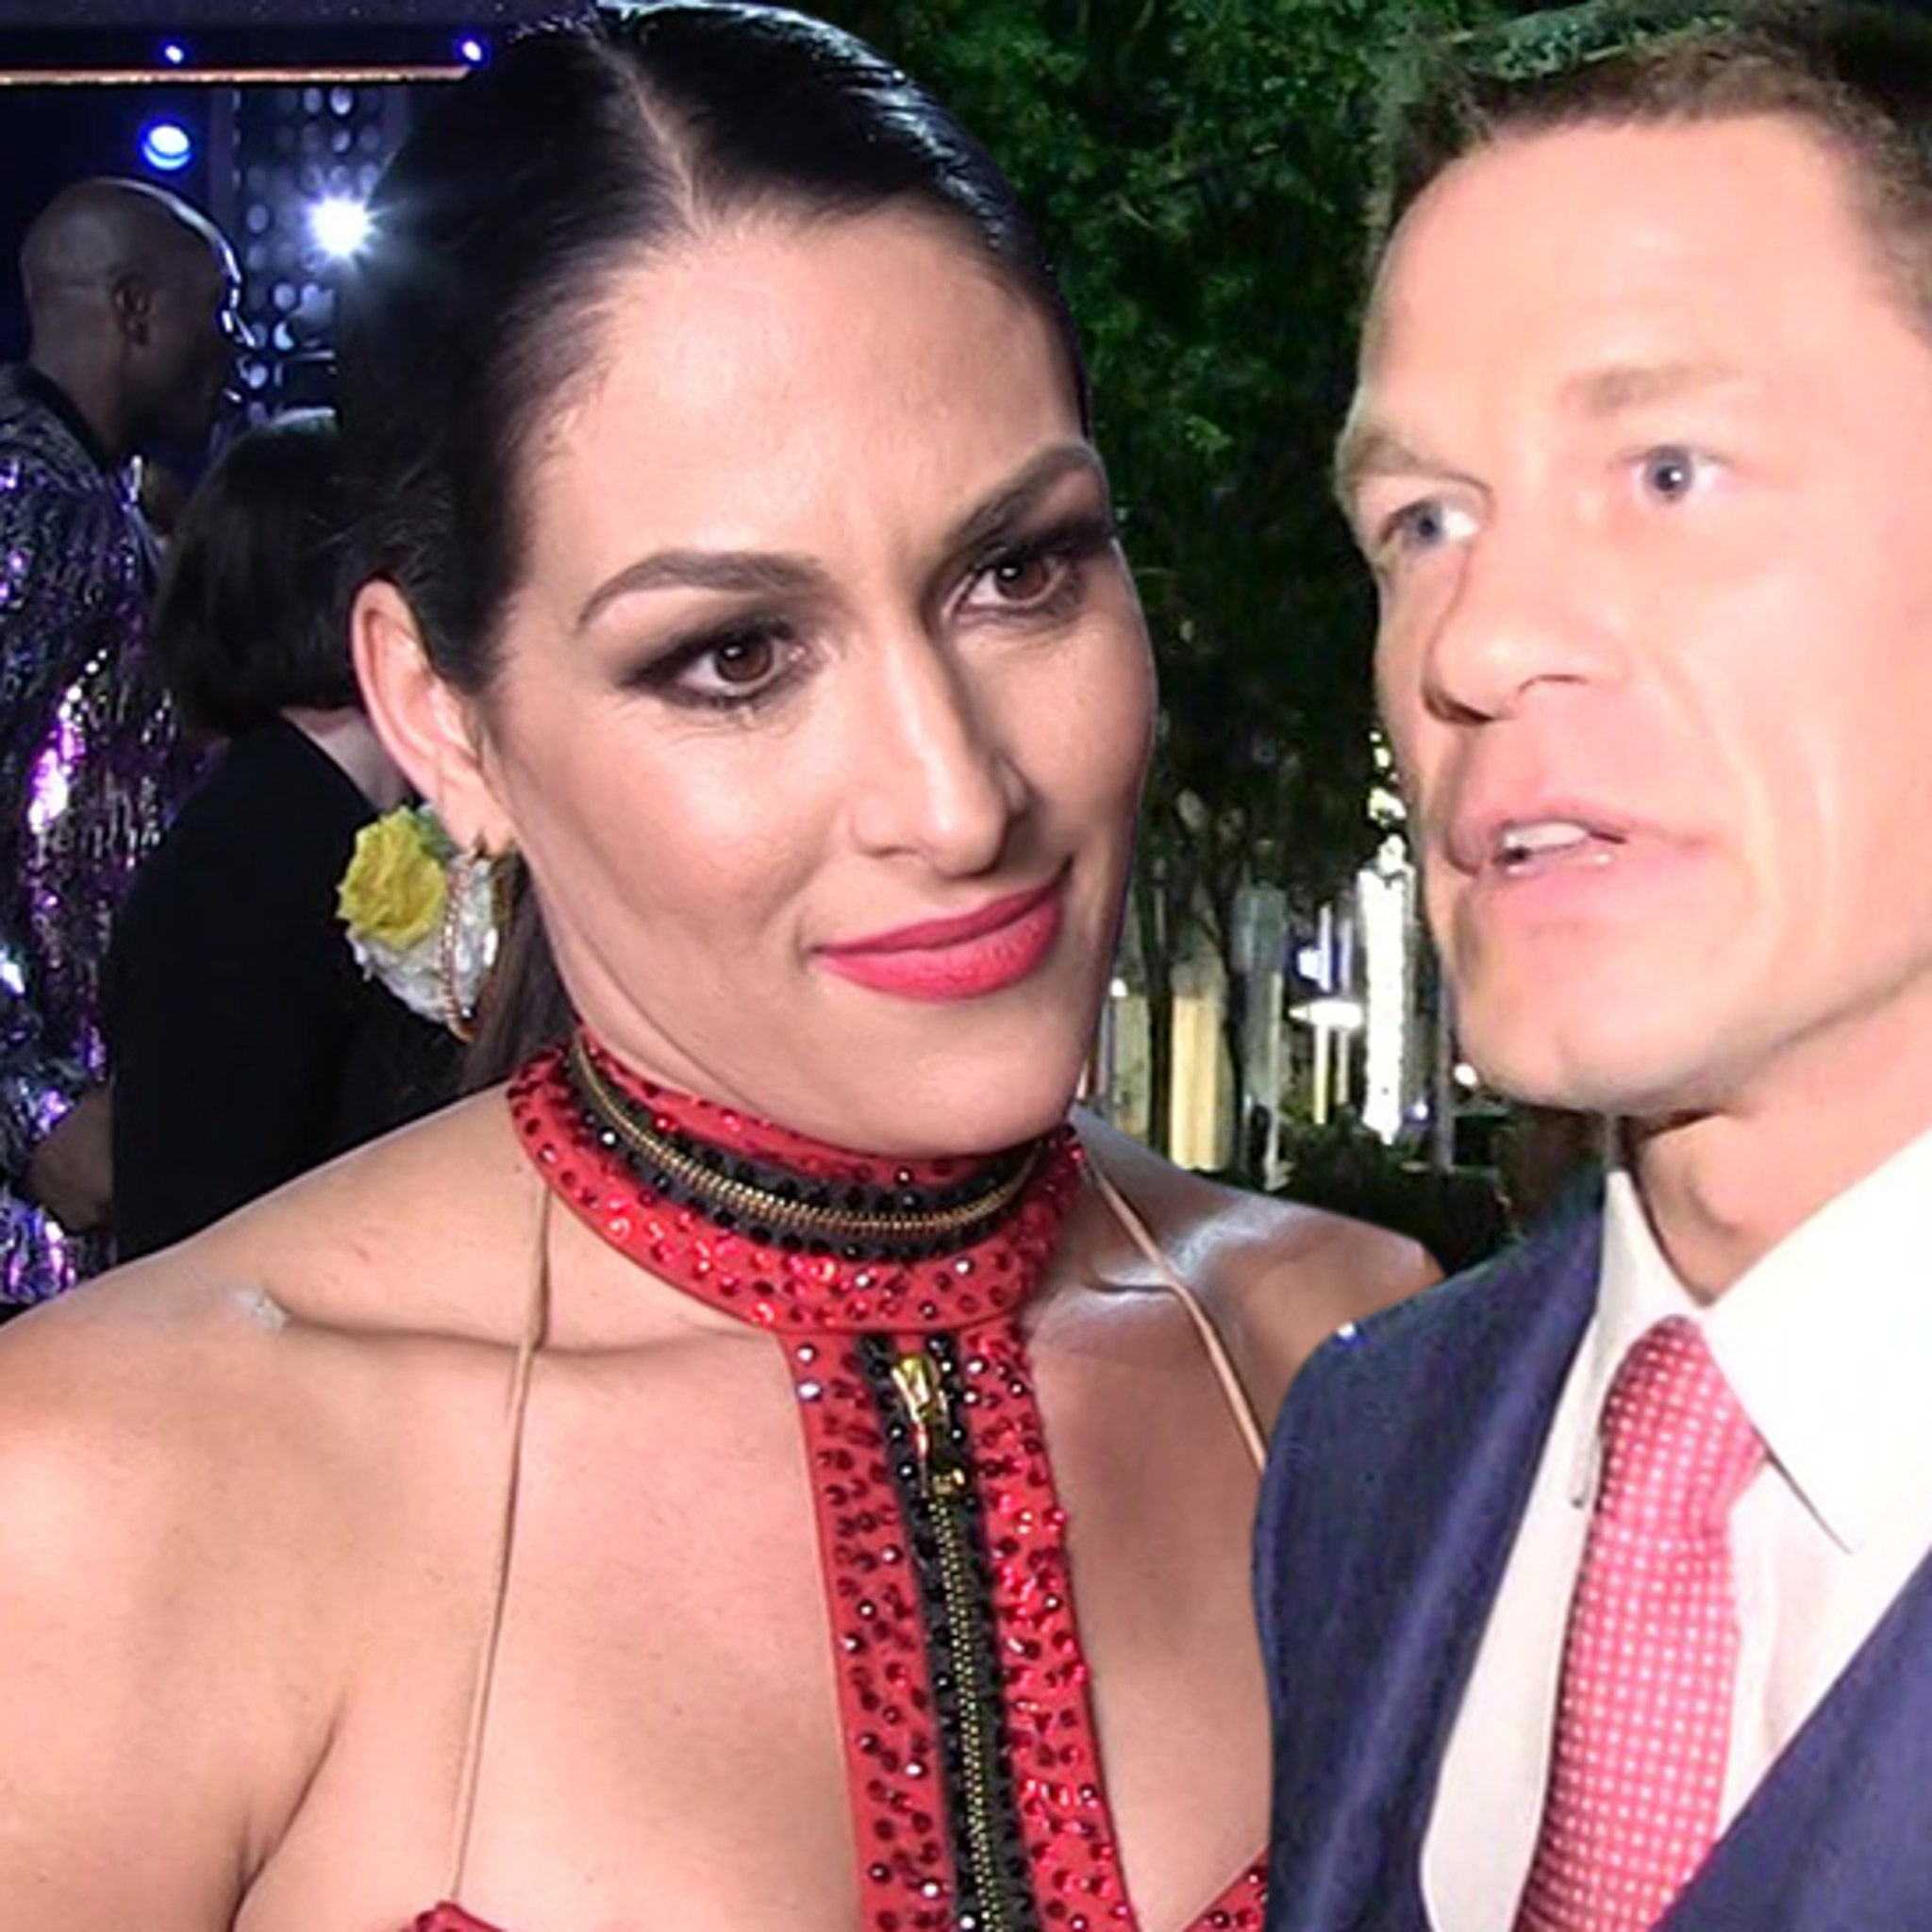 Nikki Bella And John Cena Wedding.Nikki Bella Now Believes John Cena Wants Kids But Wedding Still Off